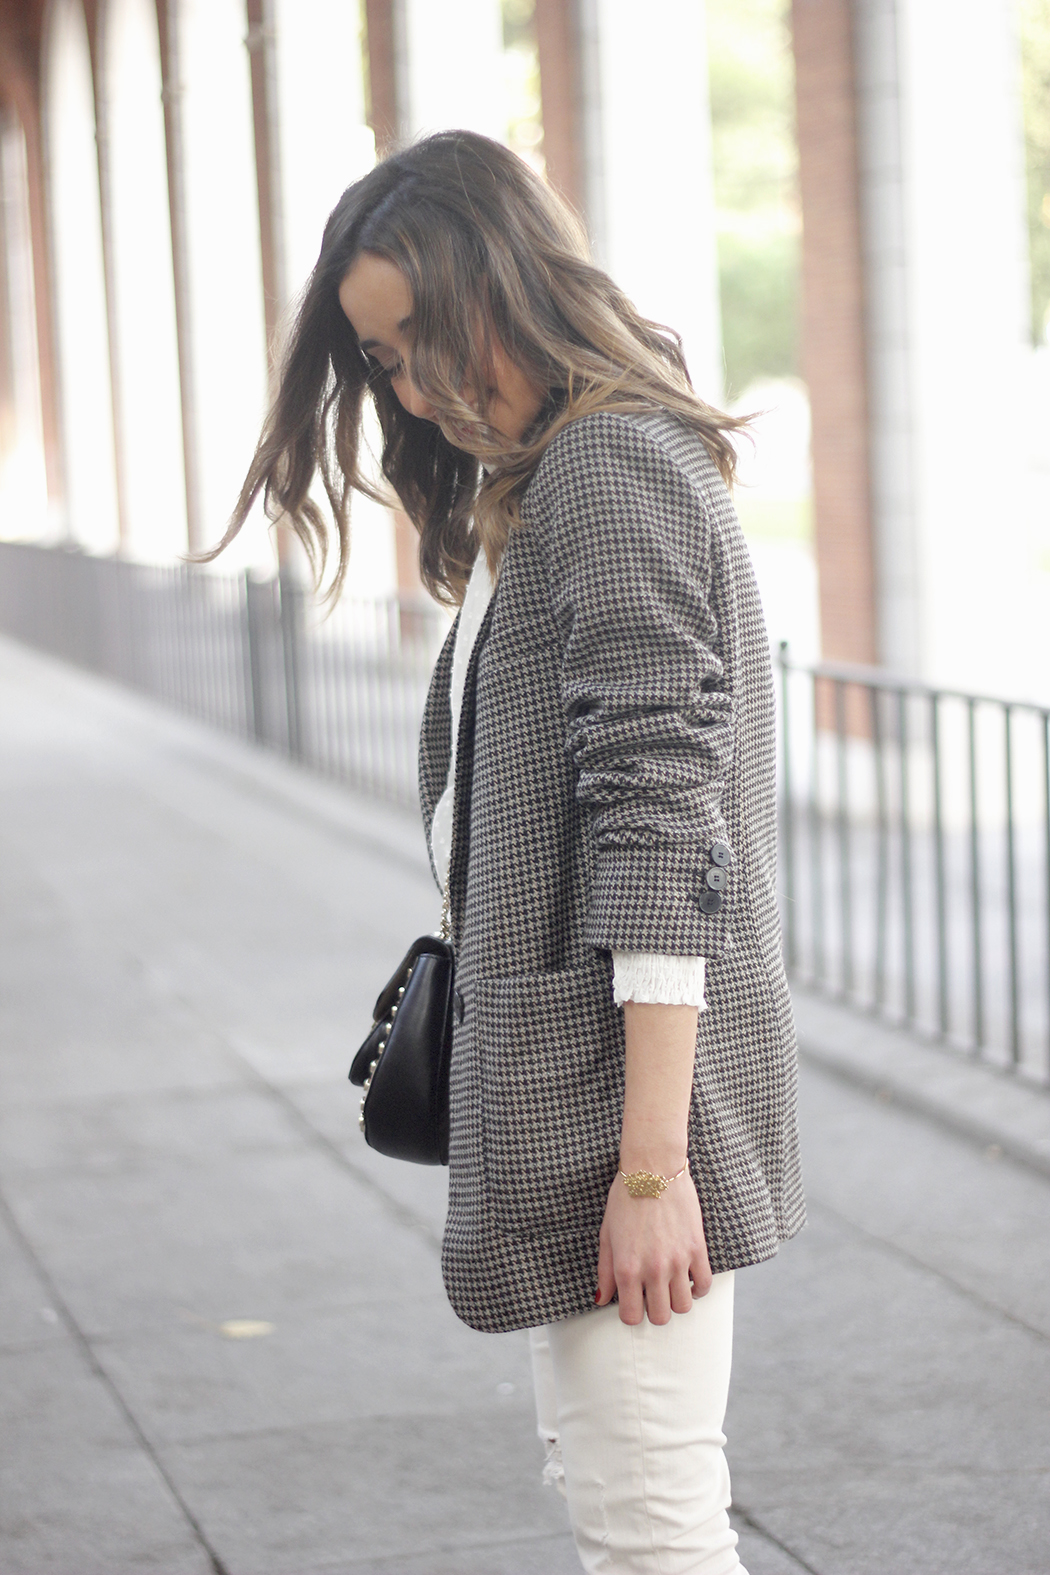 Plumeti blouse houndstooth blazer white jeans outfit style streetstyle11